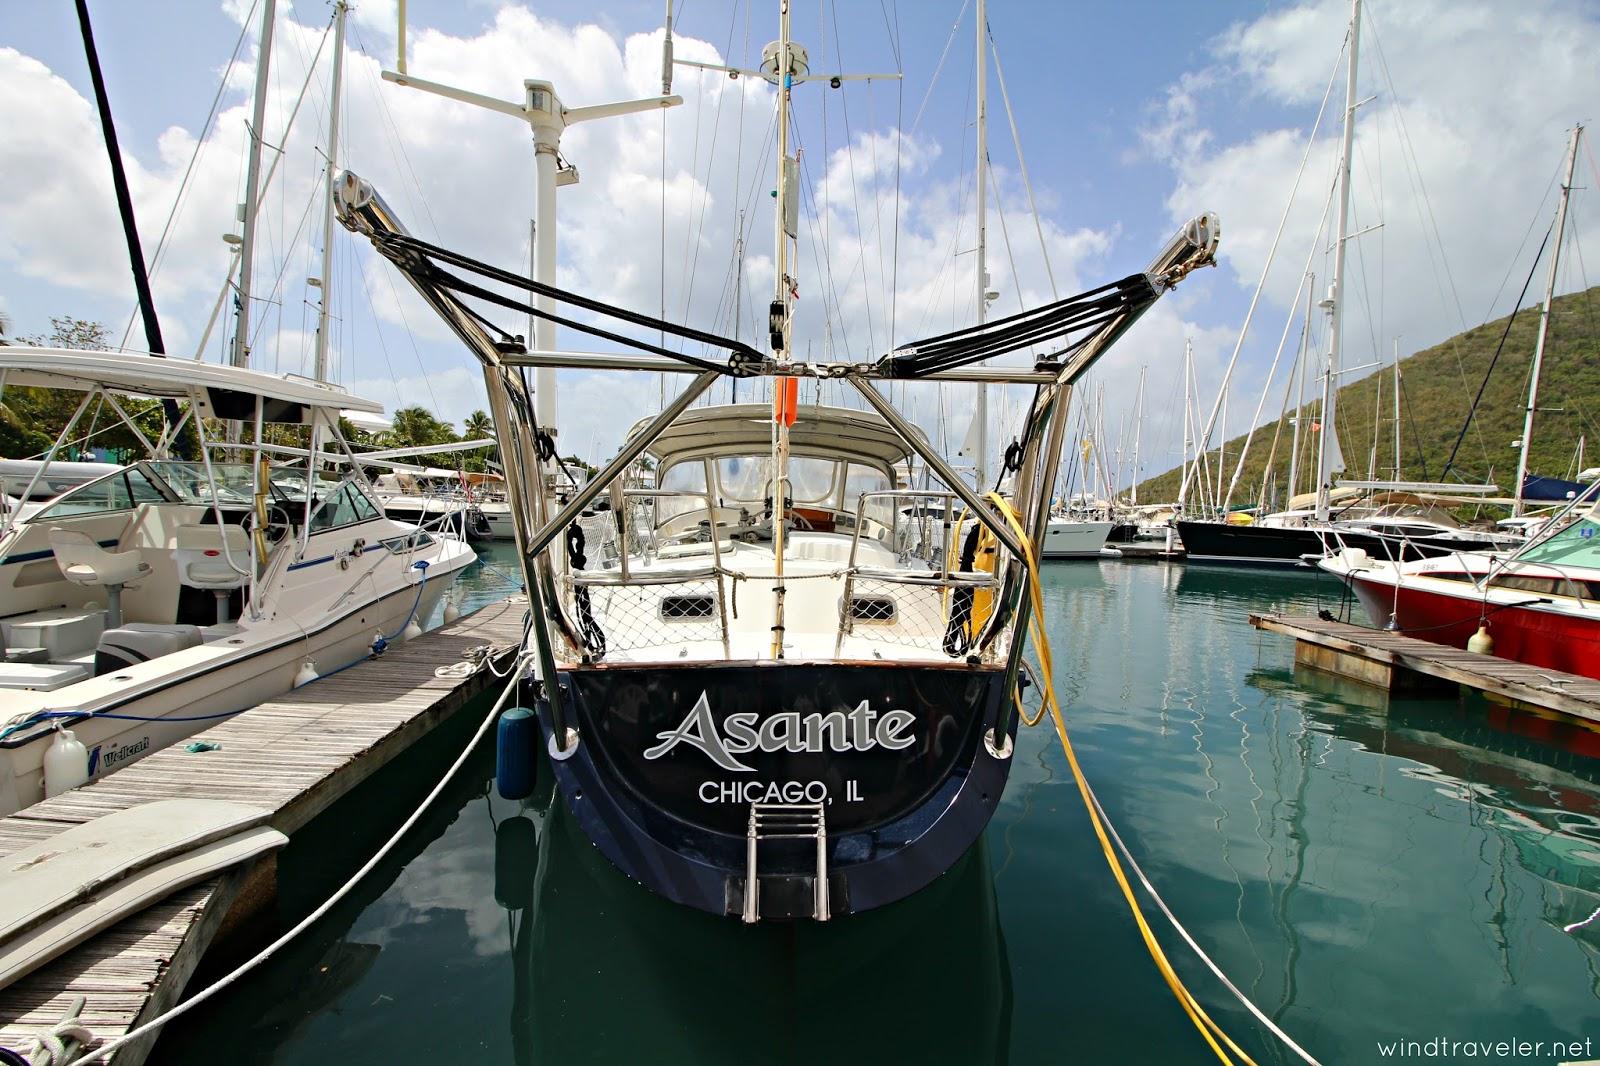 Windtraveler: Windtraveler: Asante Is FOR SALE: Blue Water Brewer 44